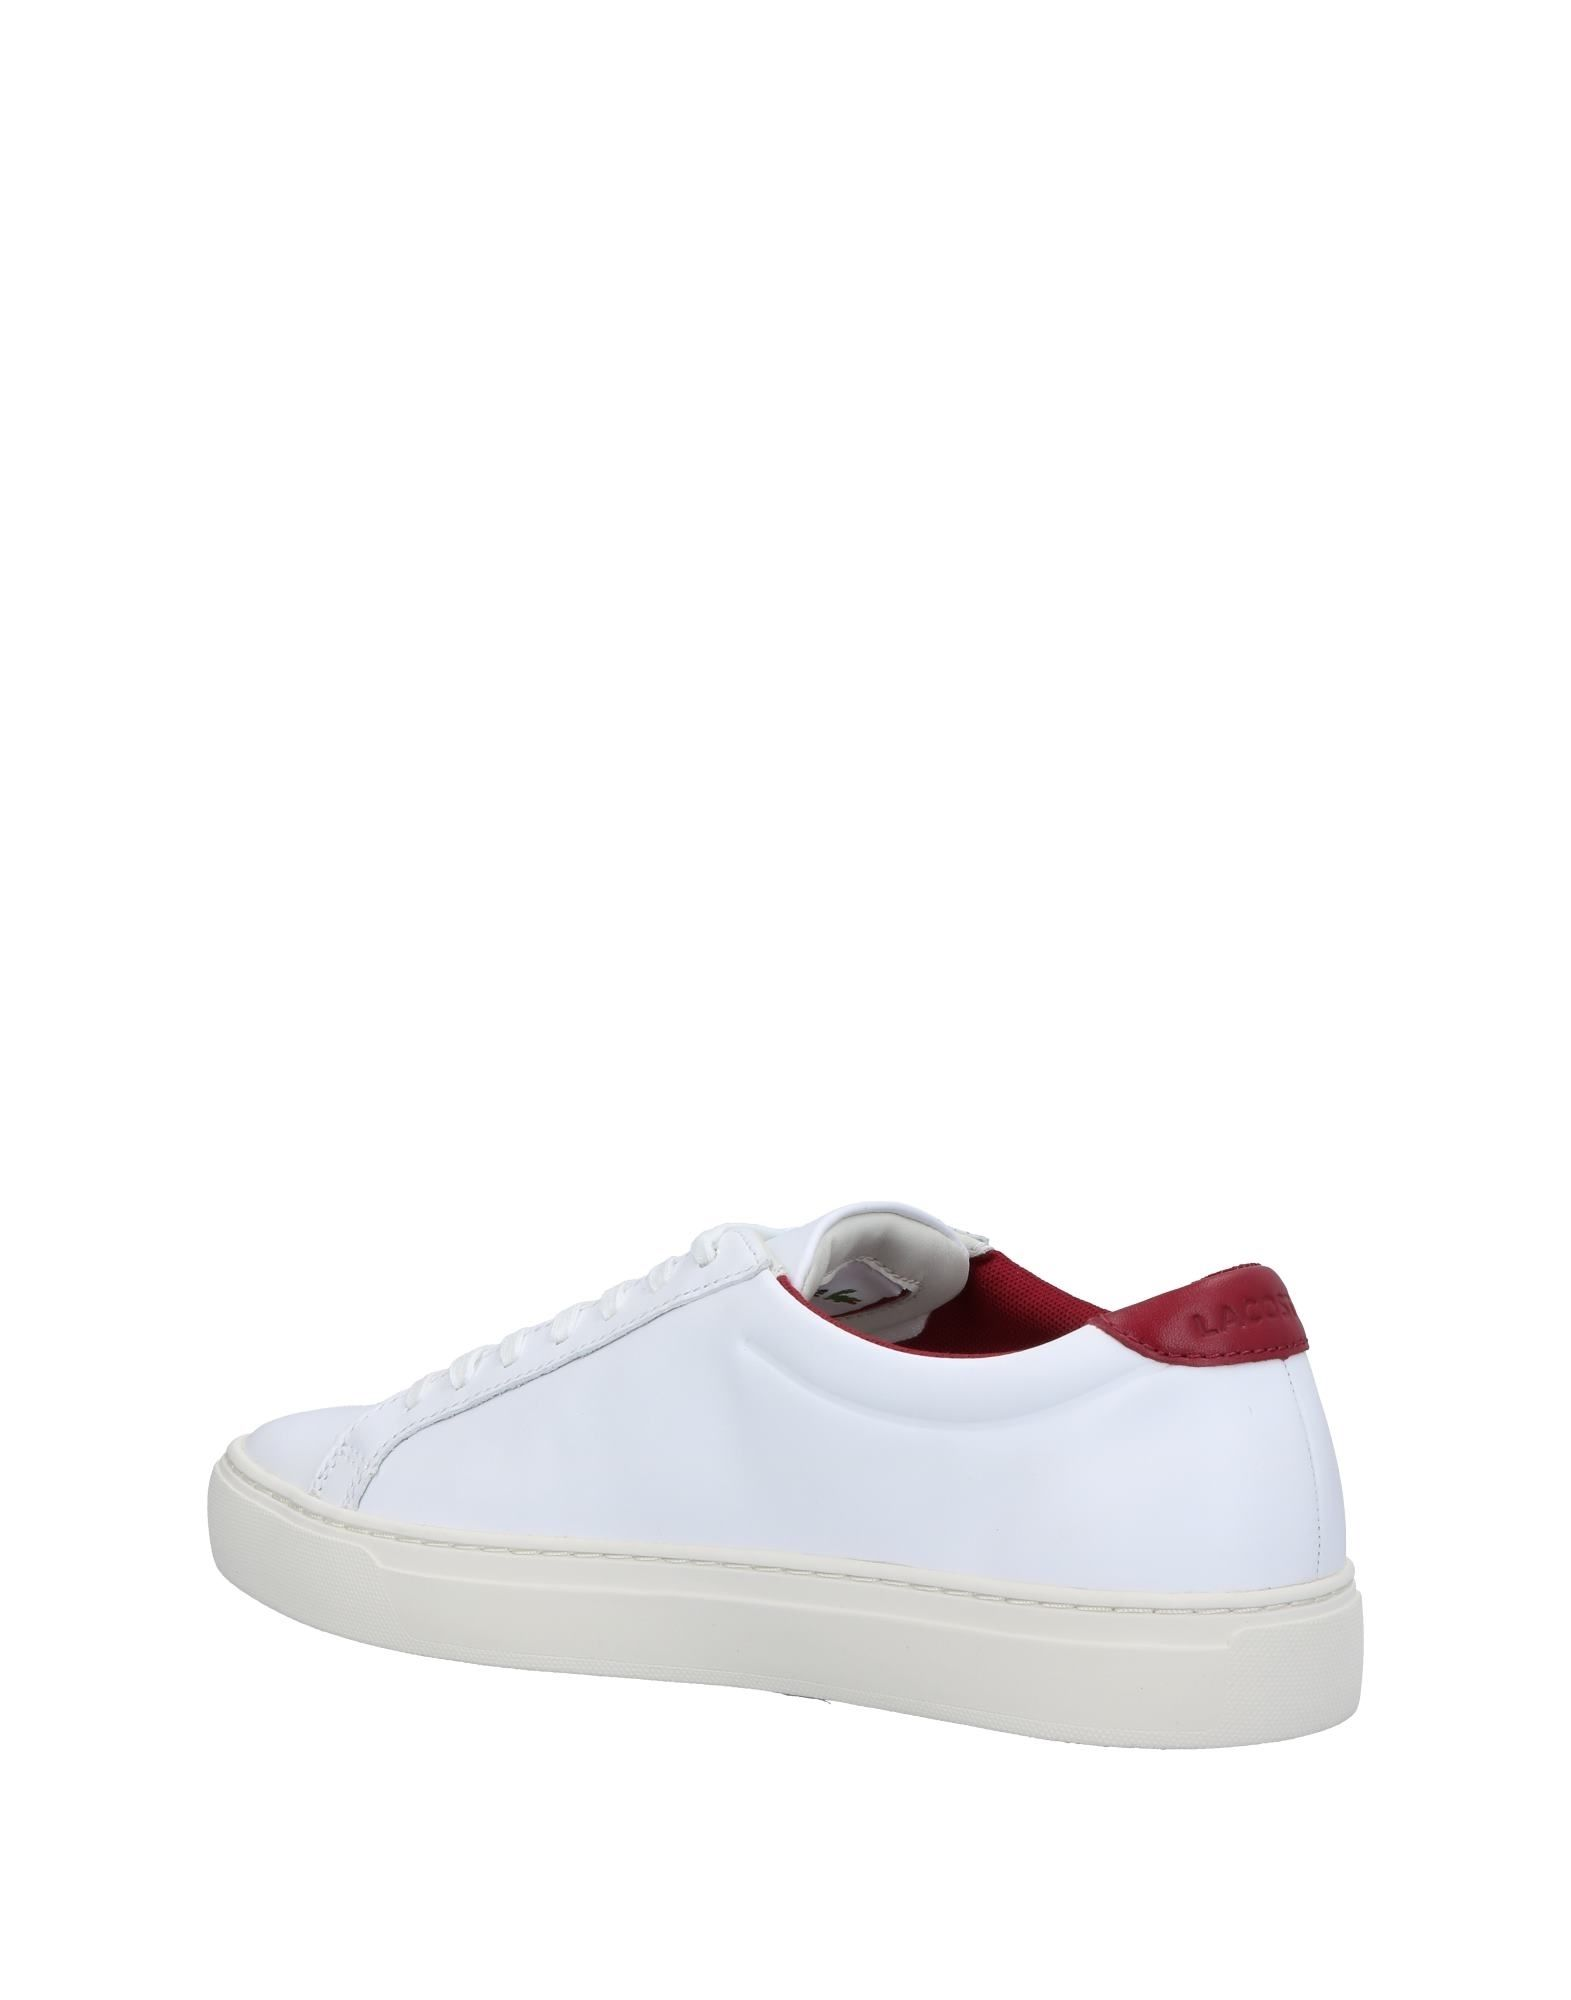 Sneakers Lacoste Homme - Sneakers Lacoste sur